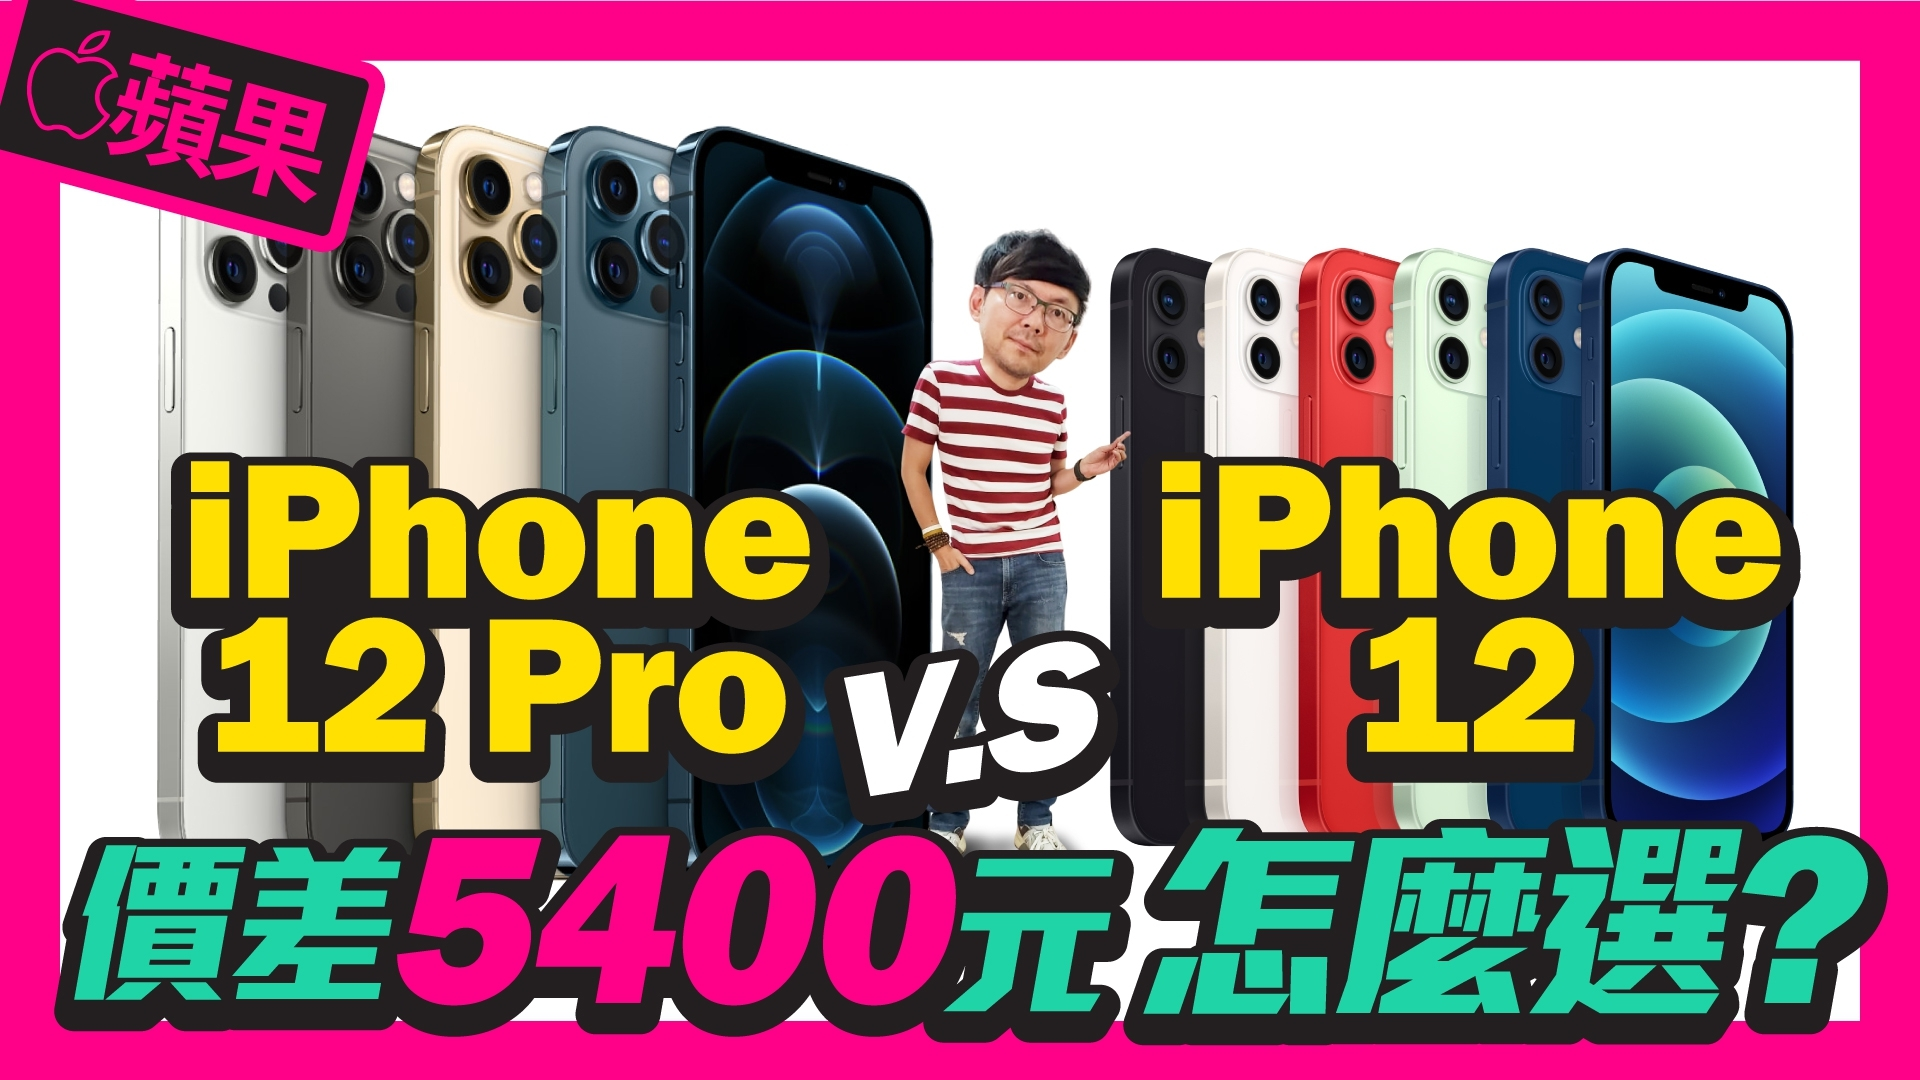 iPhone 12與iPhone 12 Pro差5400元怎麼選?這一點是關鍵!解答網友2疑問[Apple蘋果Q&A]